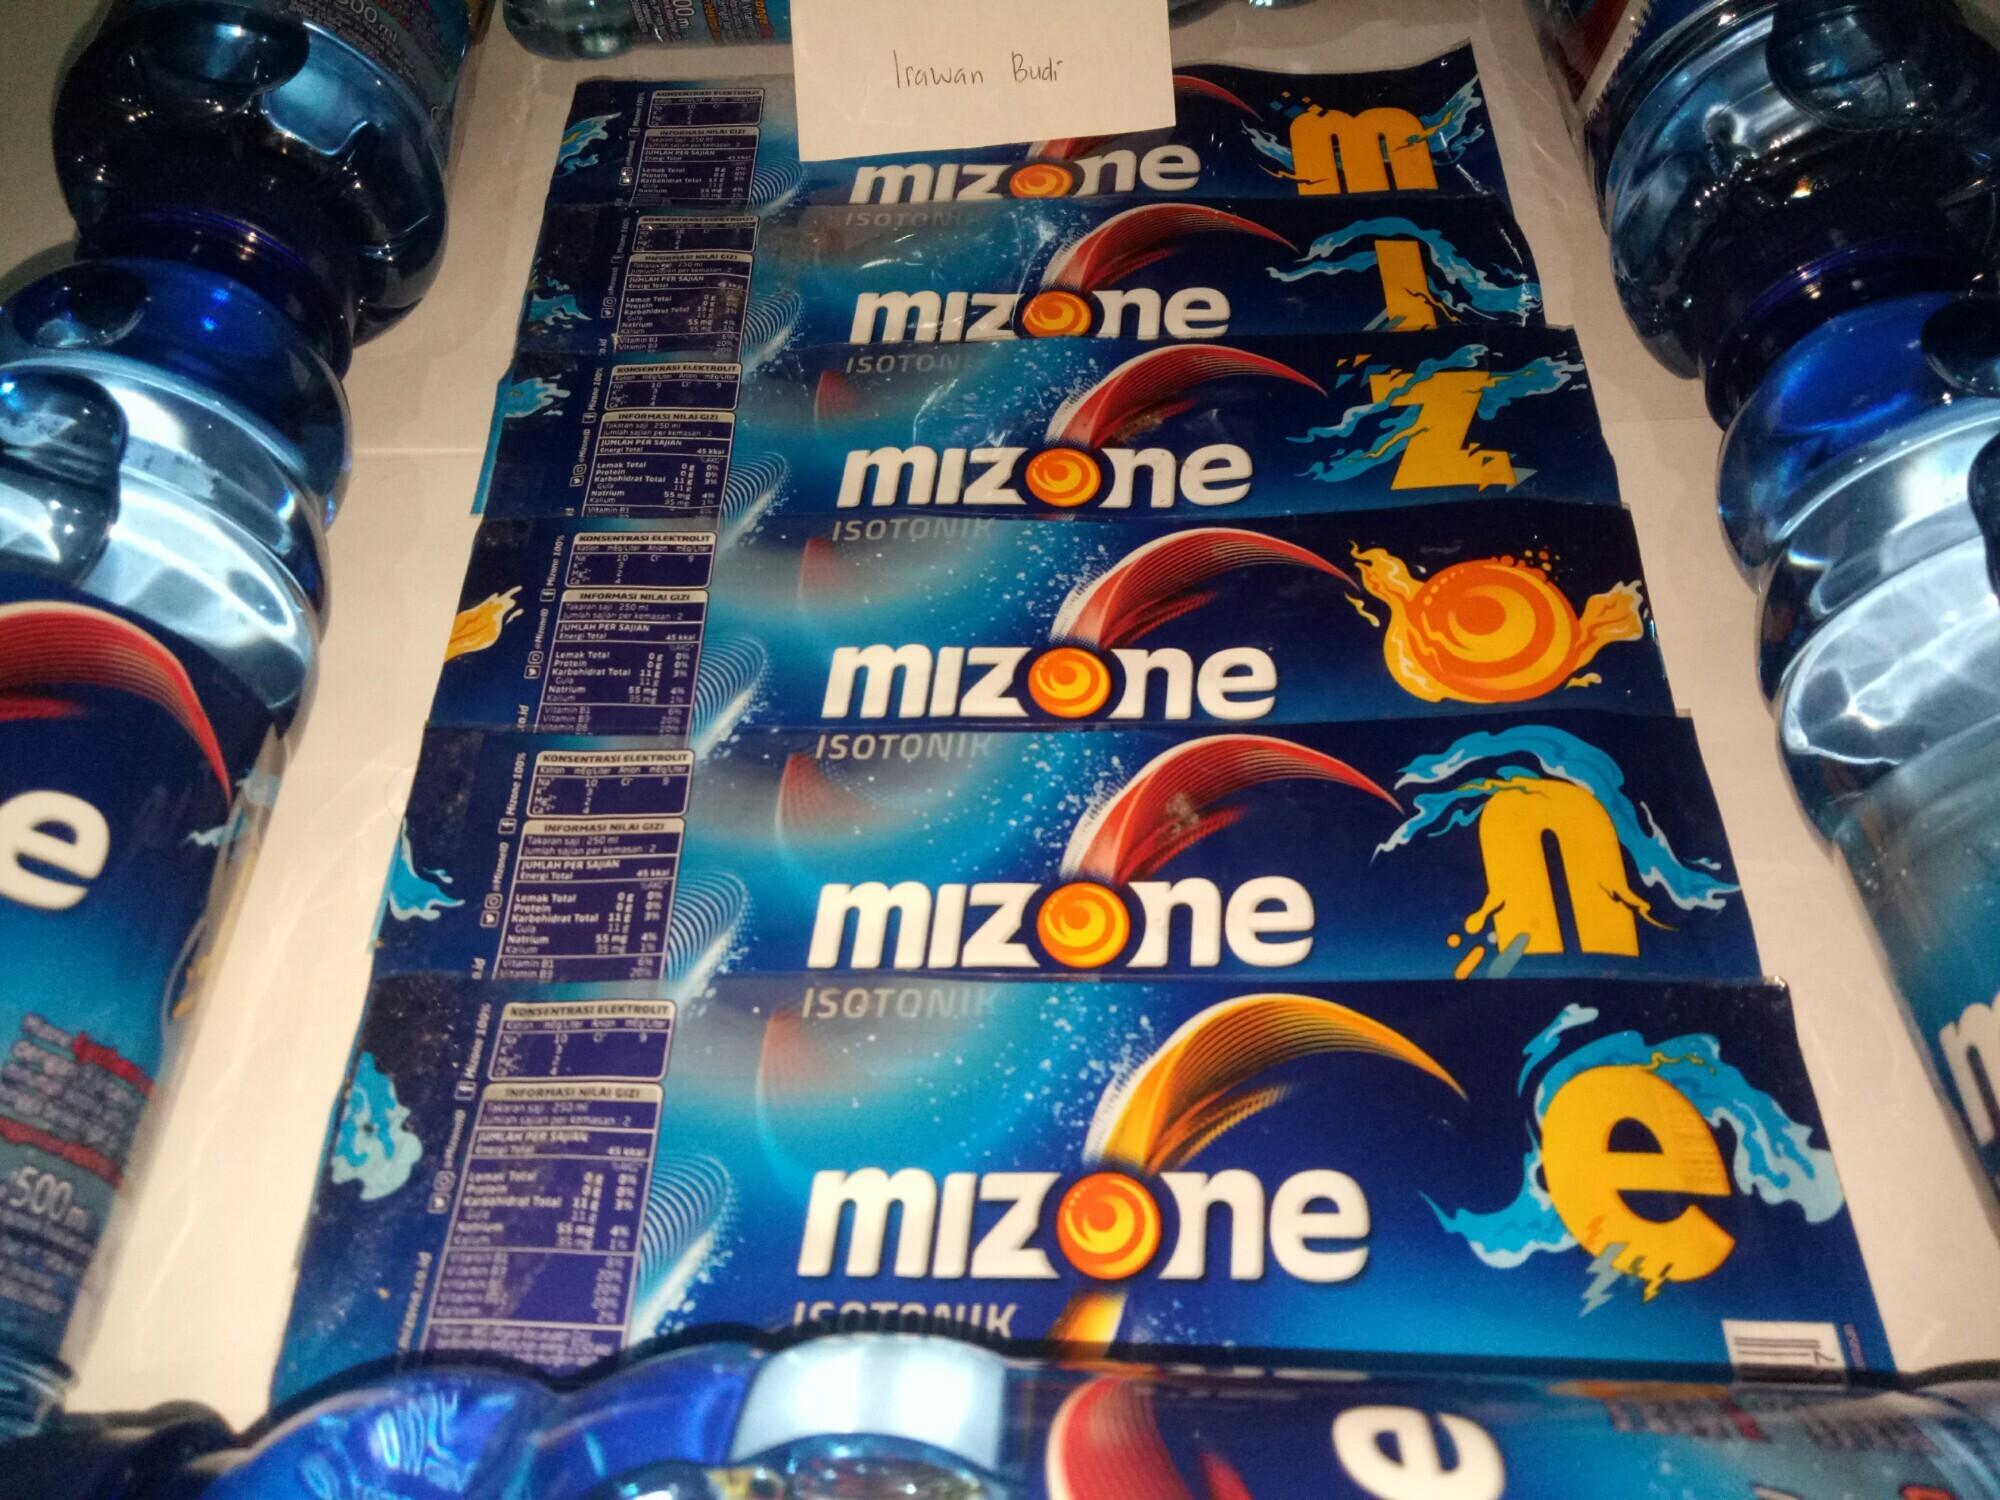 #KASKUSxMizone Ane Pen Hadiah Ignis dari Mizone, Gan!